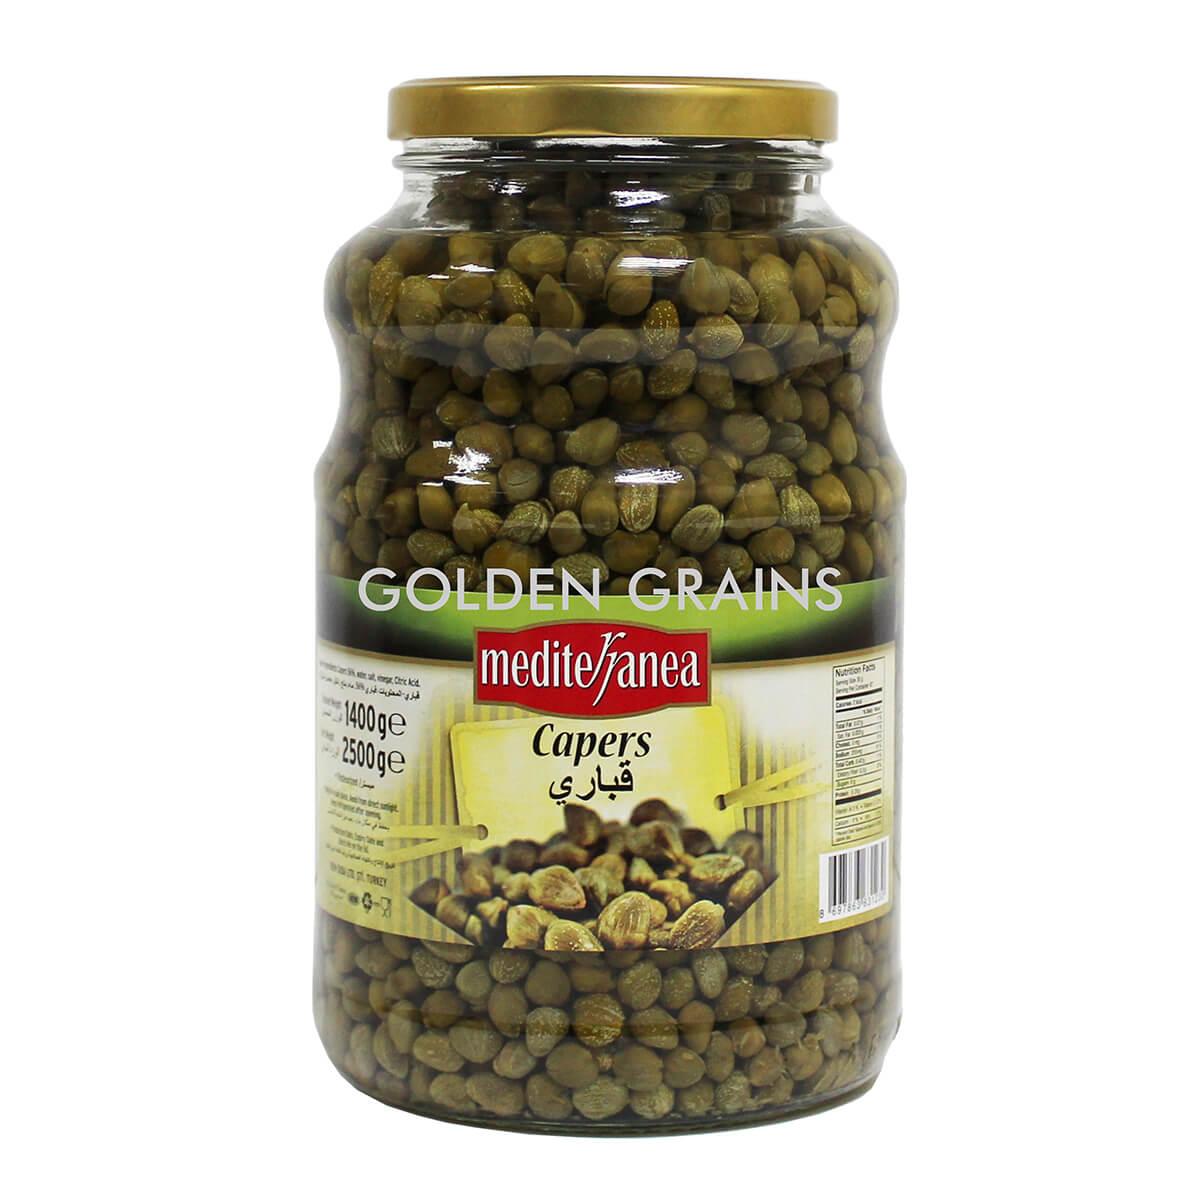 Golden Grains Dubai Export - Mediterranea - Capers - Front.jpg